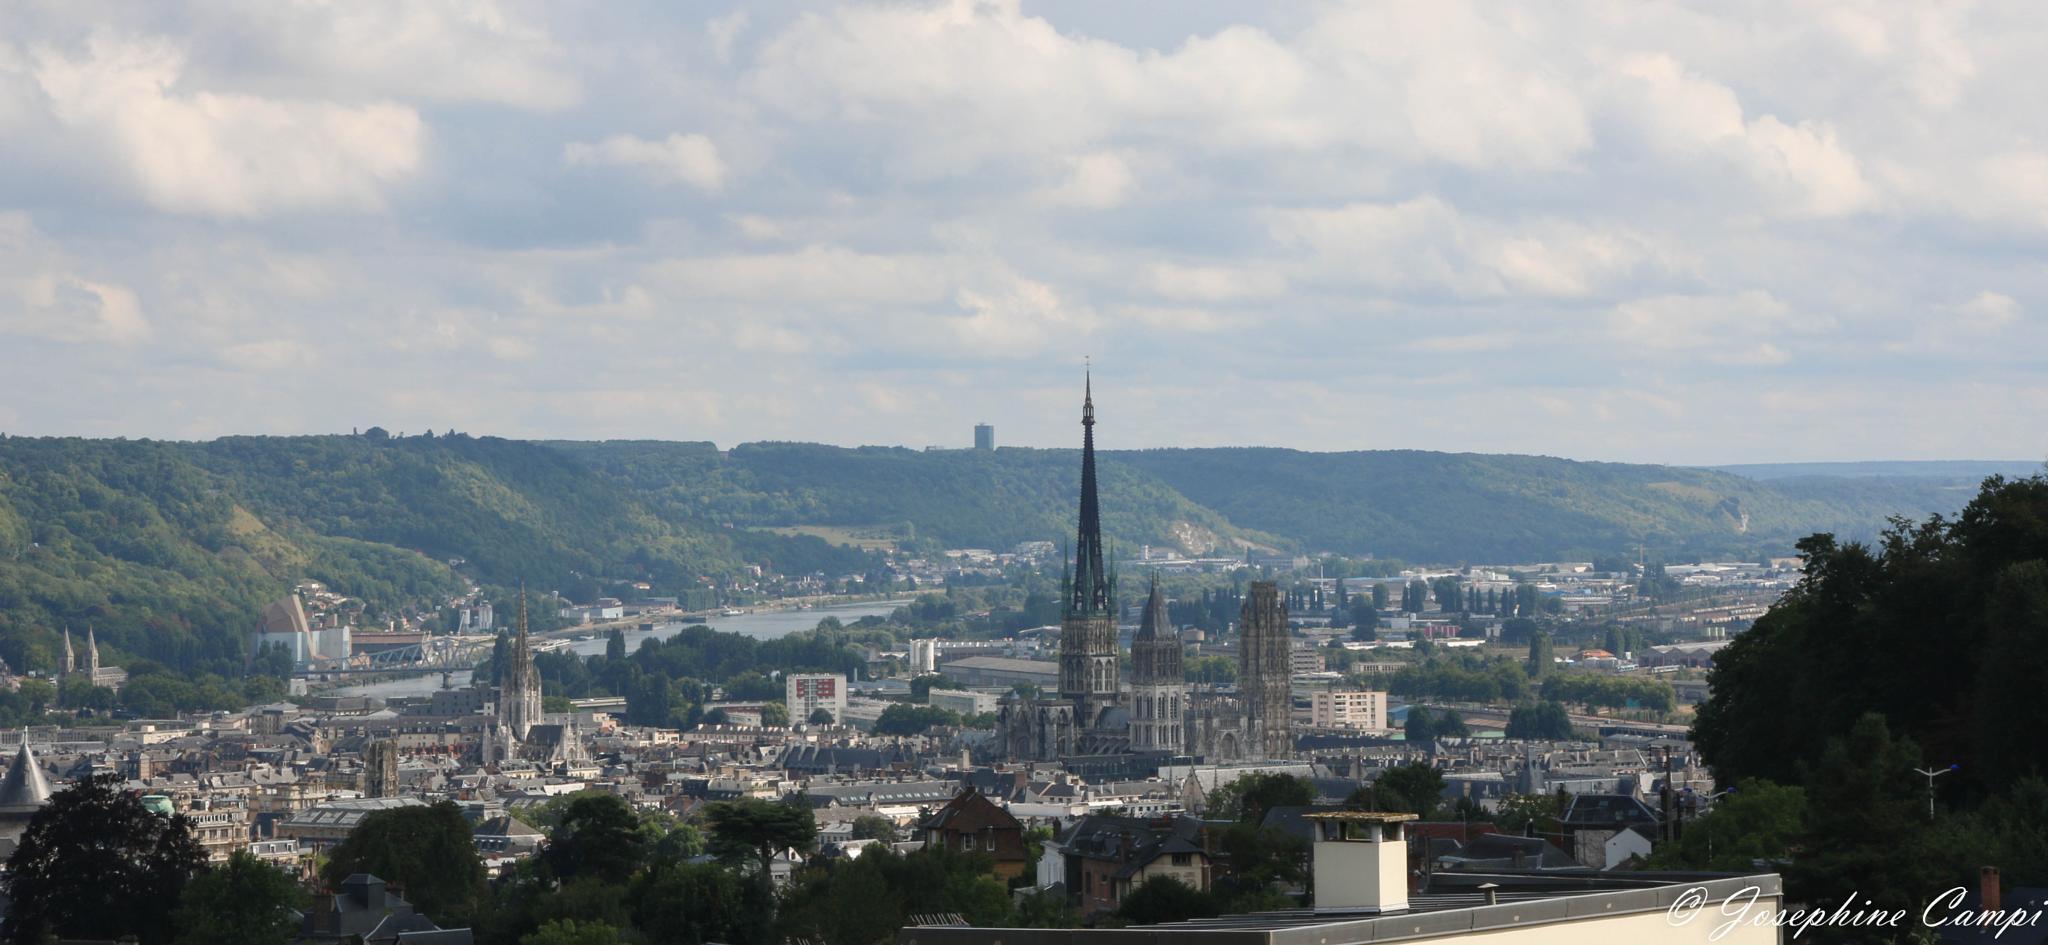 Rouen .. by josephine Campi